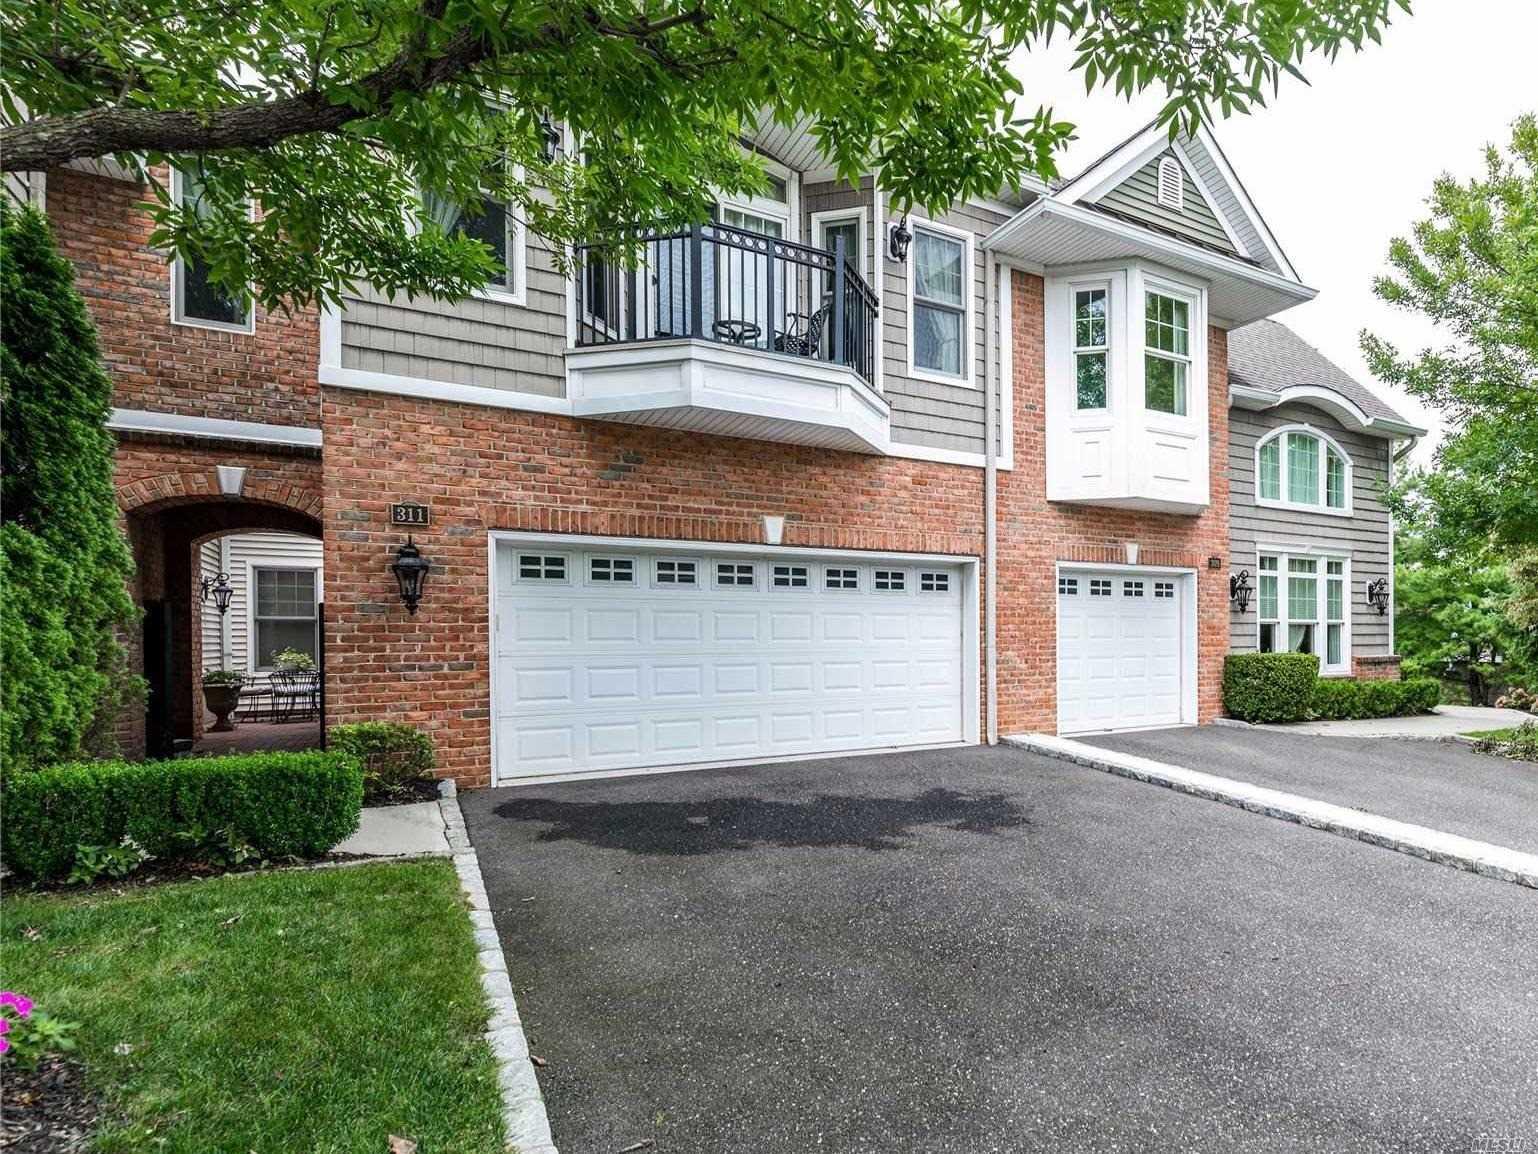 Property for sale at 311 Trotting Lane Unit: 2403, Westbury,  New York 11590